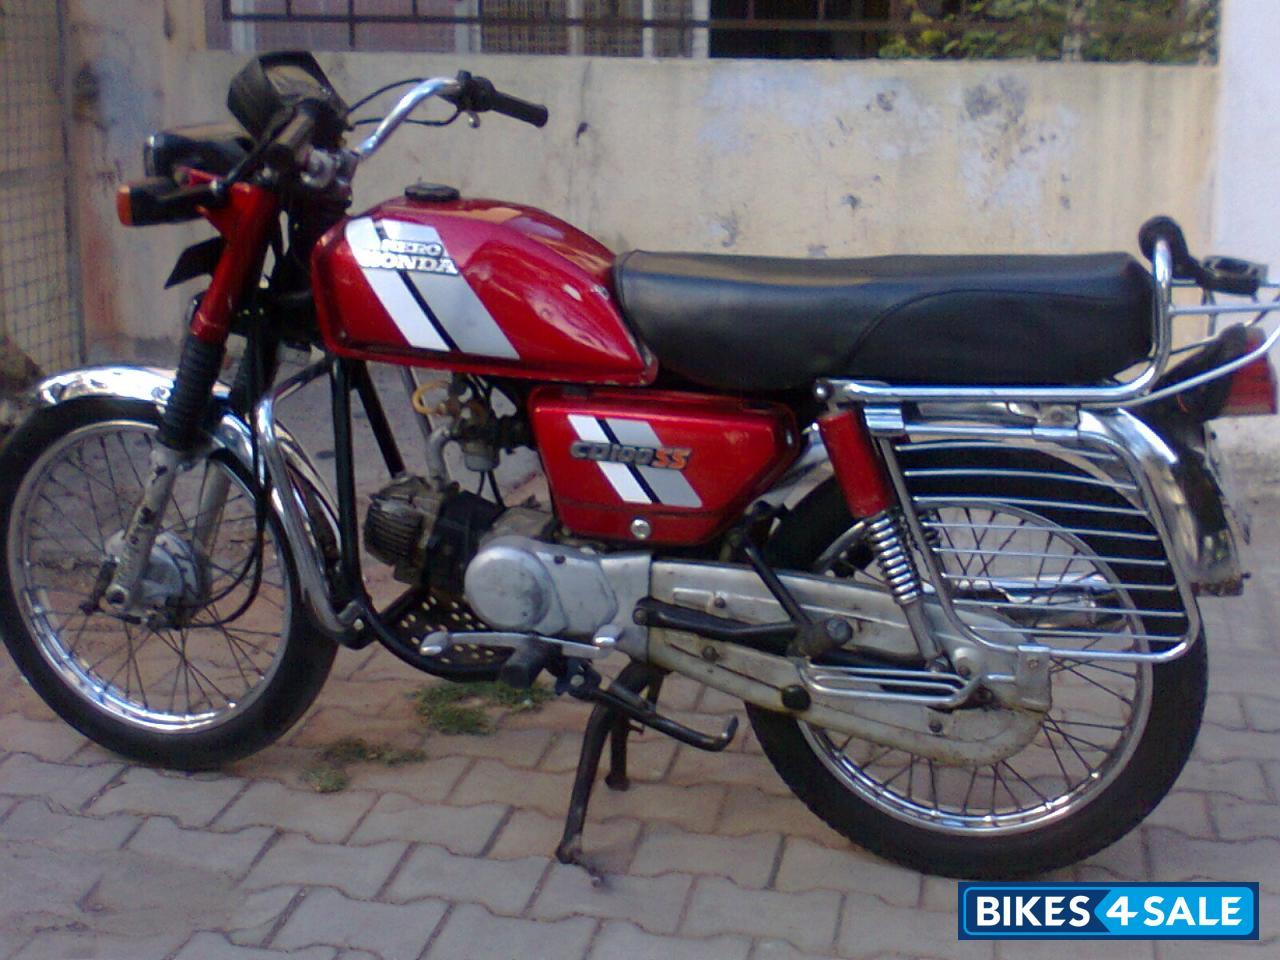 3e9b606b931 Red Hero CD 100SS Picture 1. Bike ID 69551. Bike located in ...